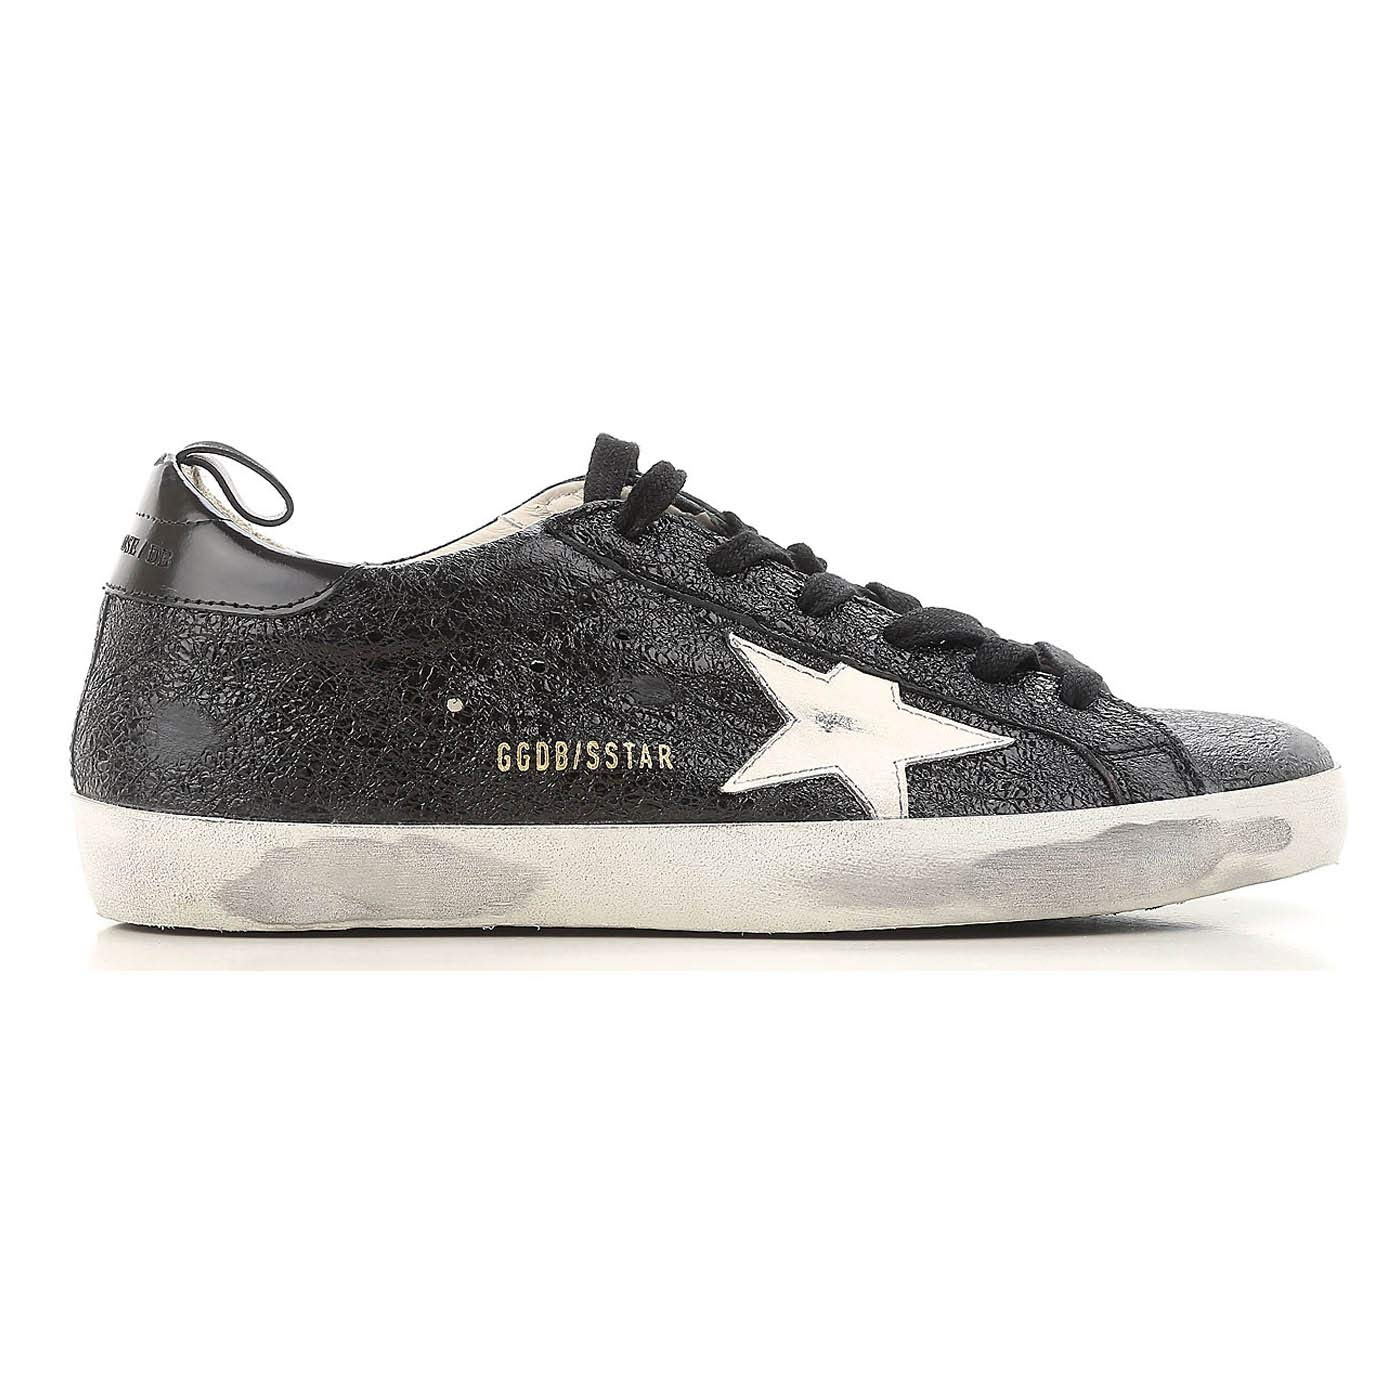 e83b0044 Amazon.com | Golden Goose Deluxe Brand Superstar Women Sneakers  G32WS590.G27 | Shoes